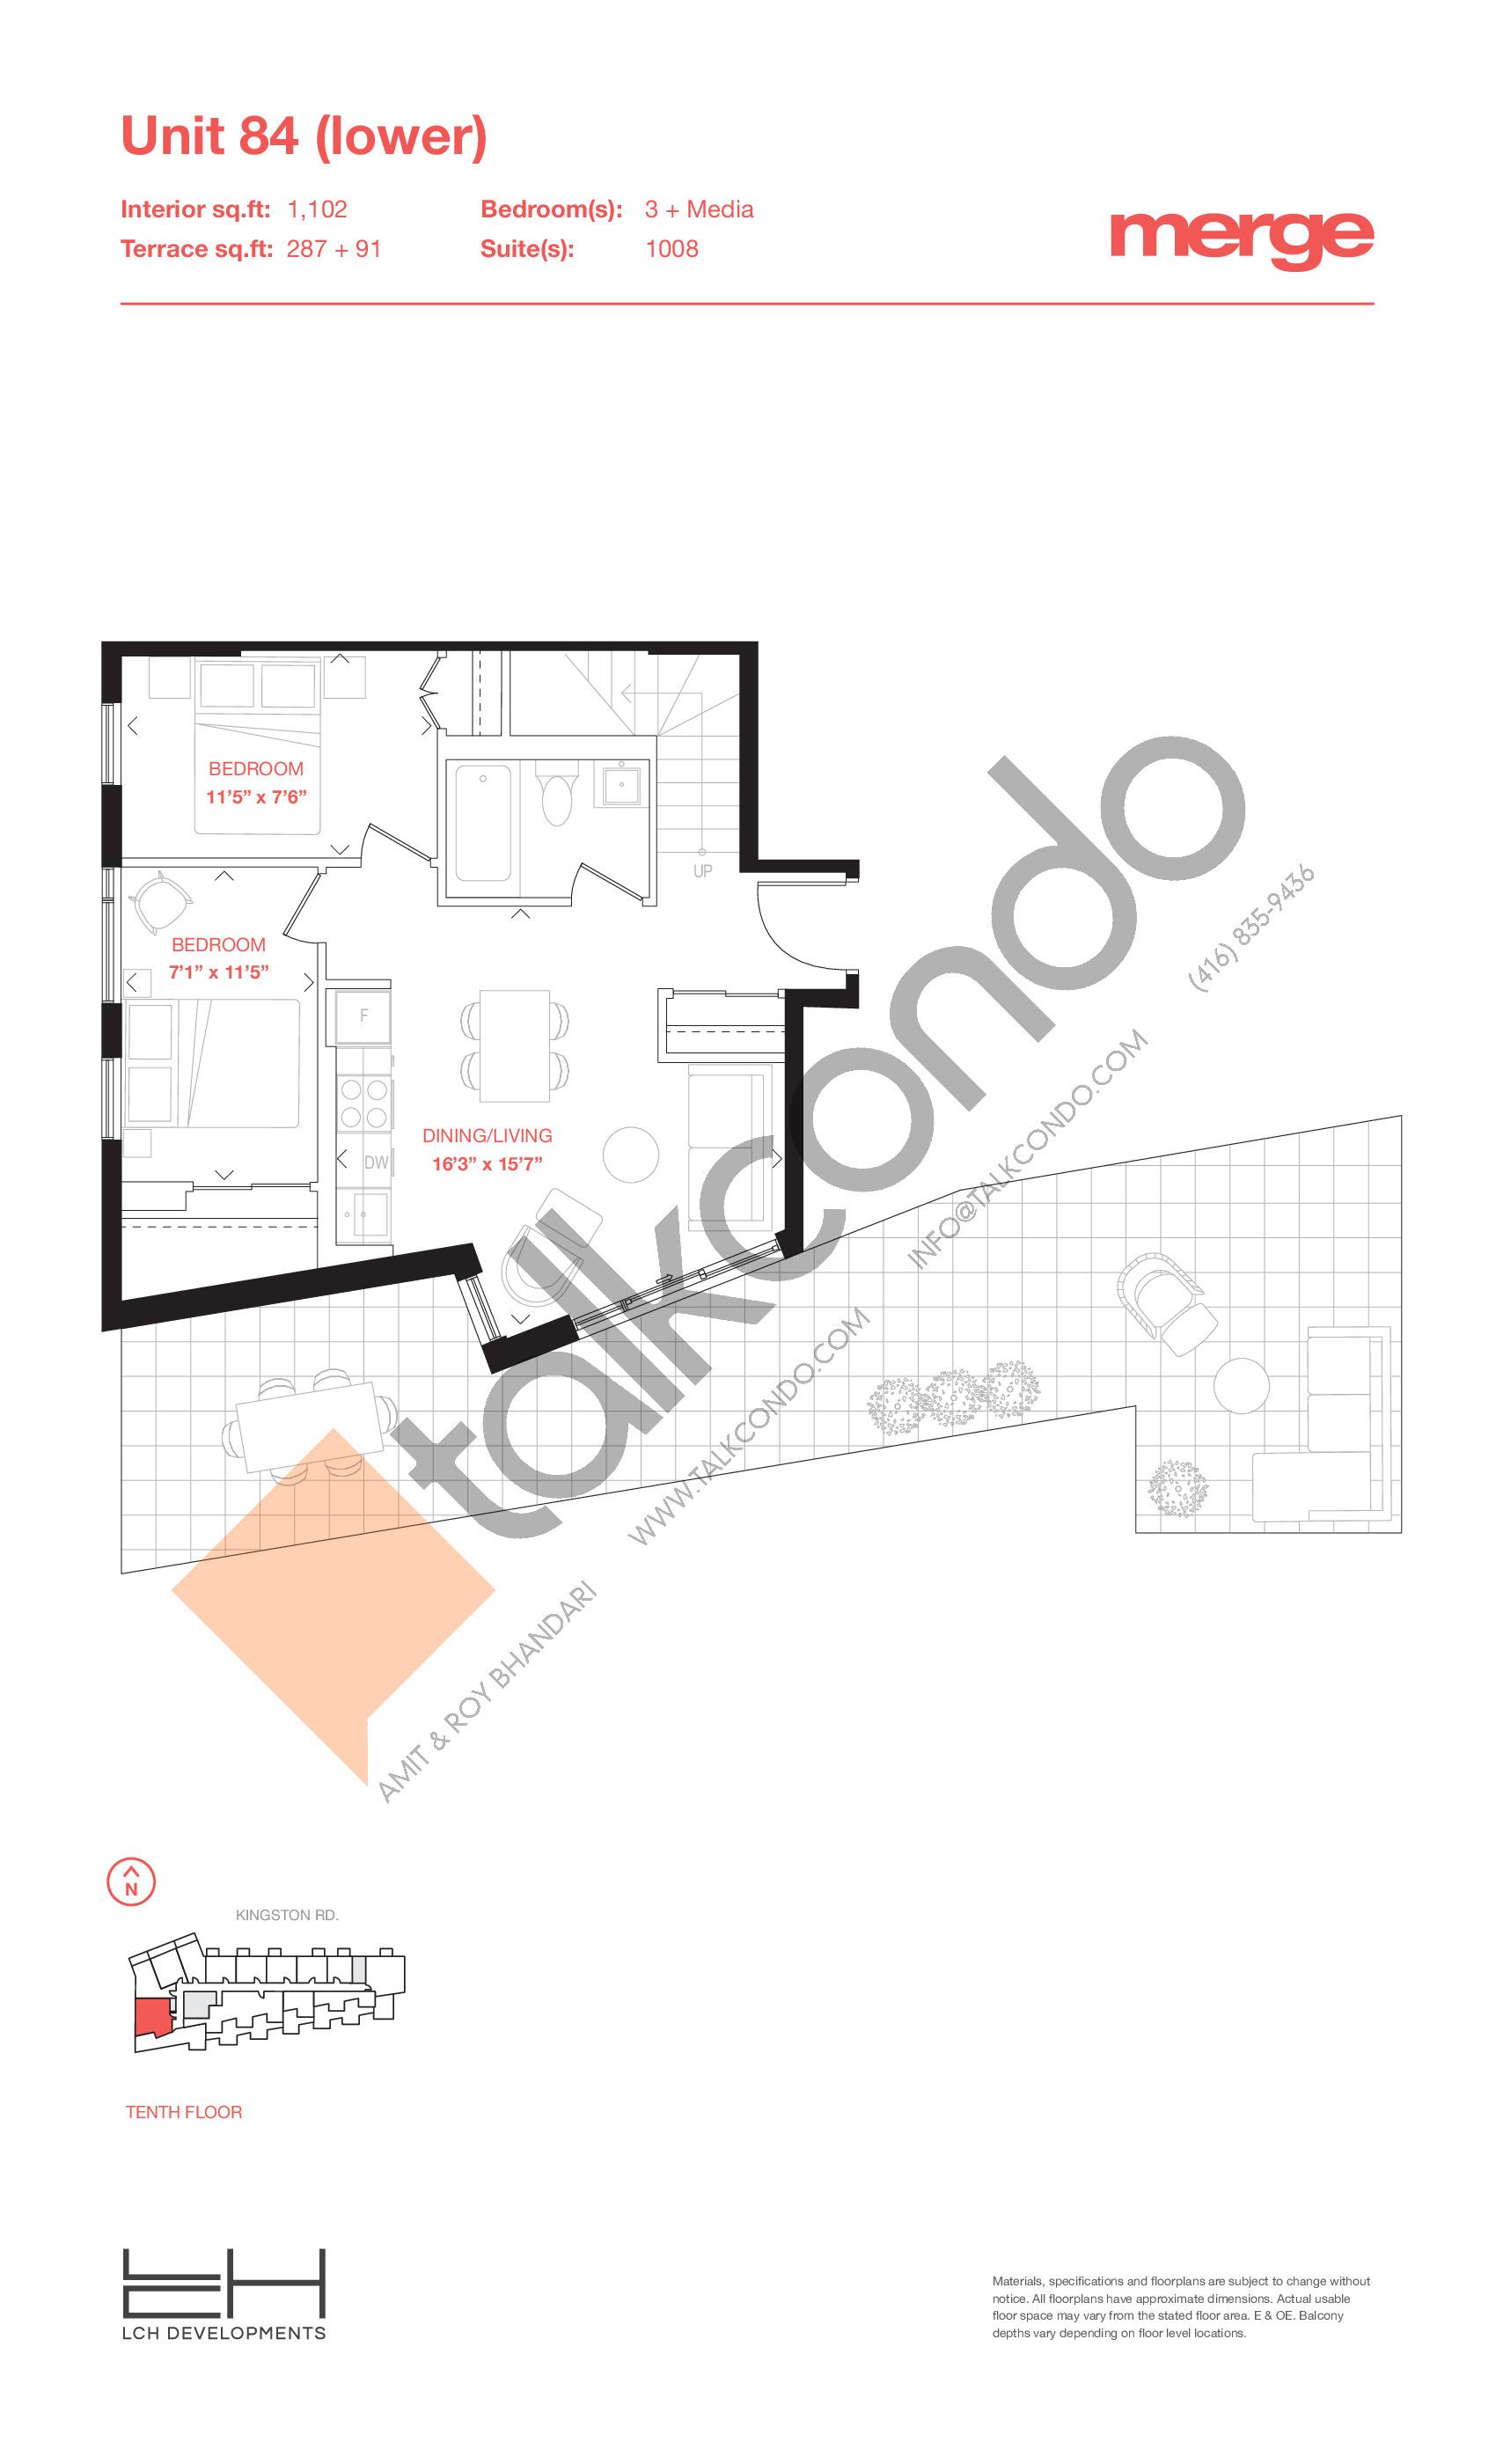 Unit 84 (Lower) - 2 Storey Floor Plan at Merge Condos - 1102 sq.ft